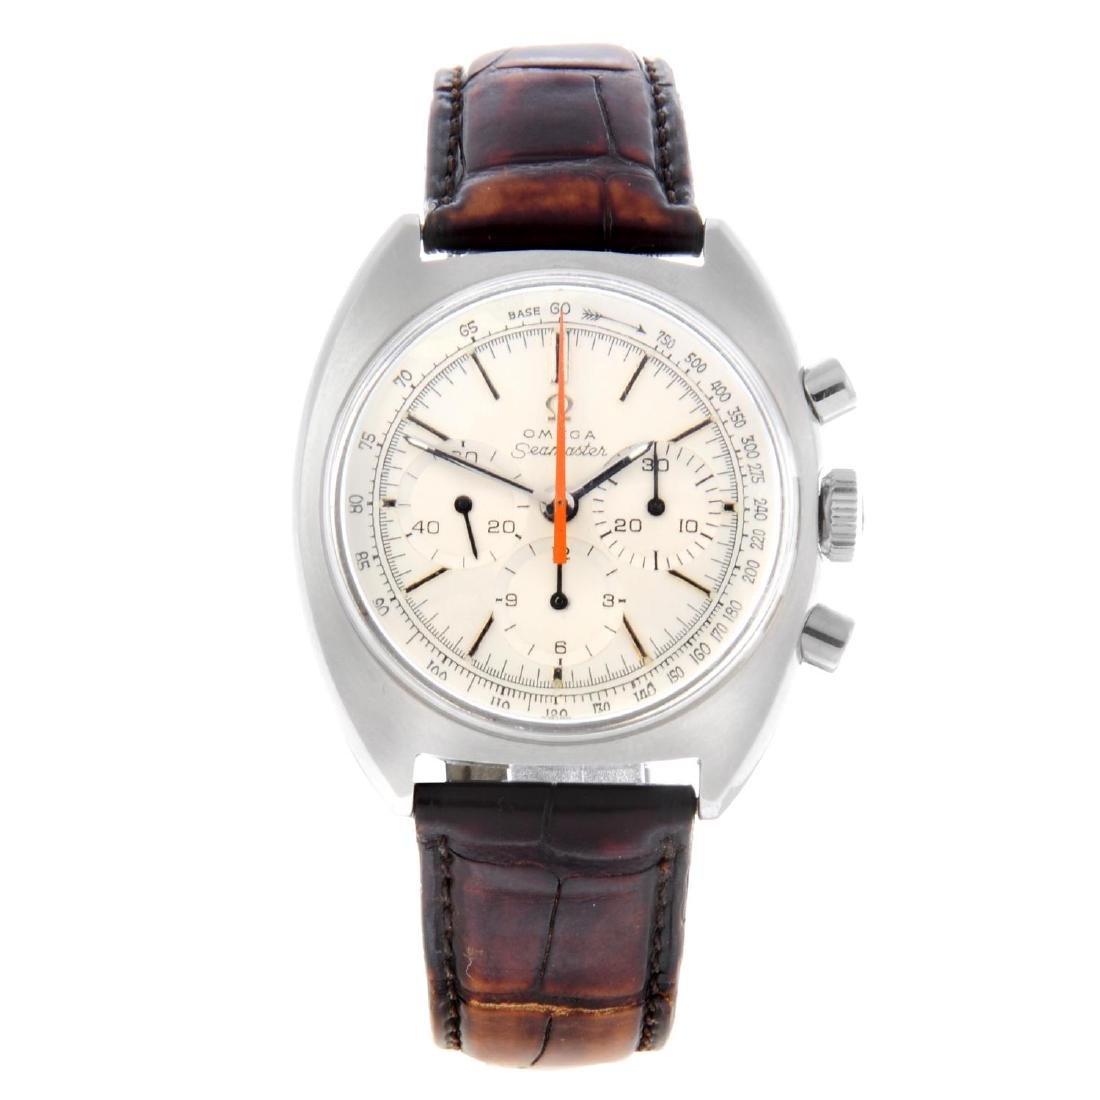 OMEGA - a gentleman's Seamaster chronograph wrist